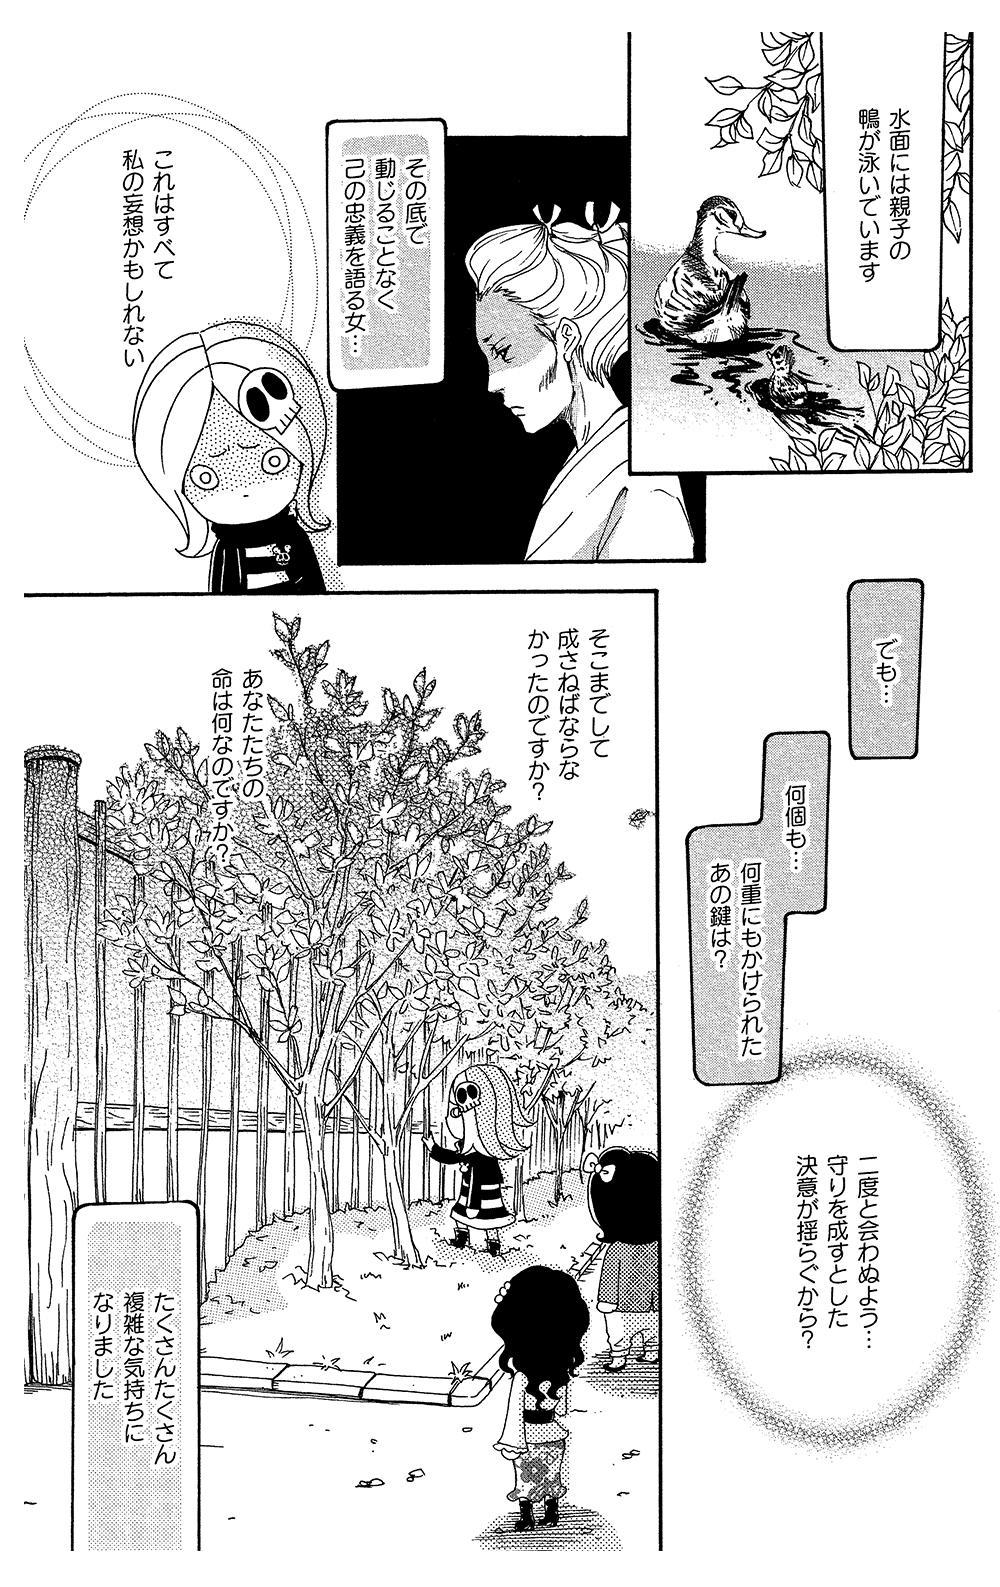 スピ☆散歩 第2話「清正井と明治神宮」②spsanp04-06.jpg